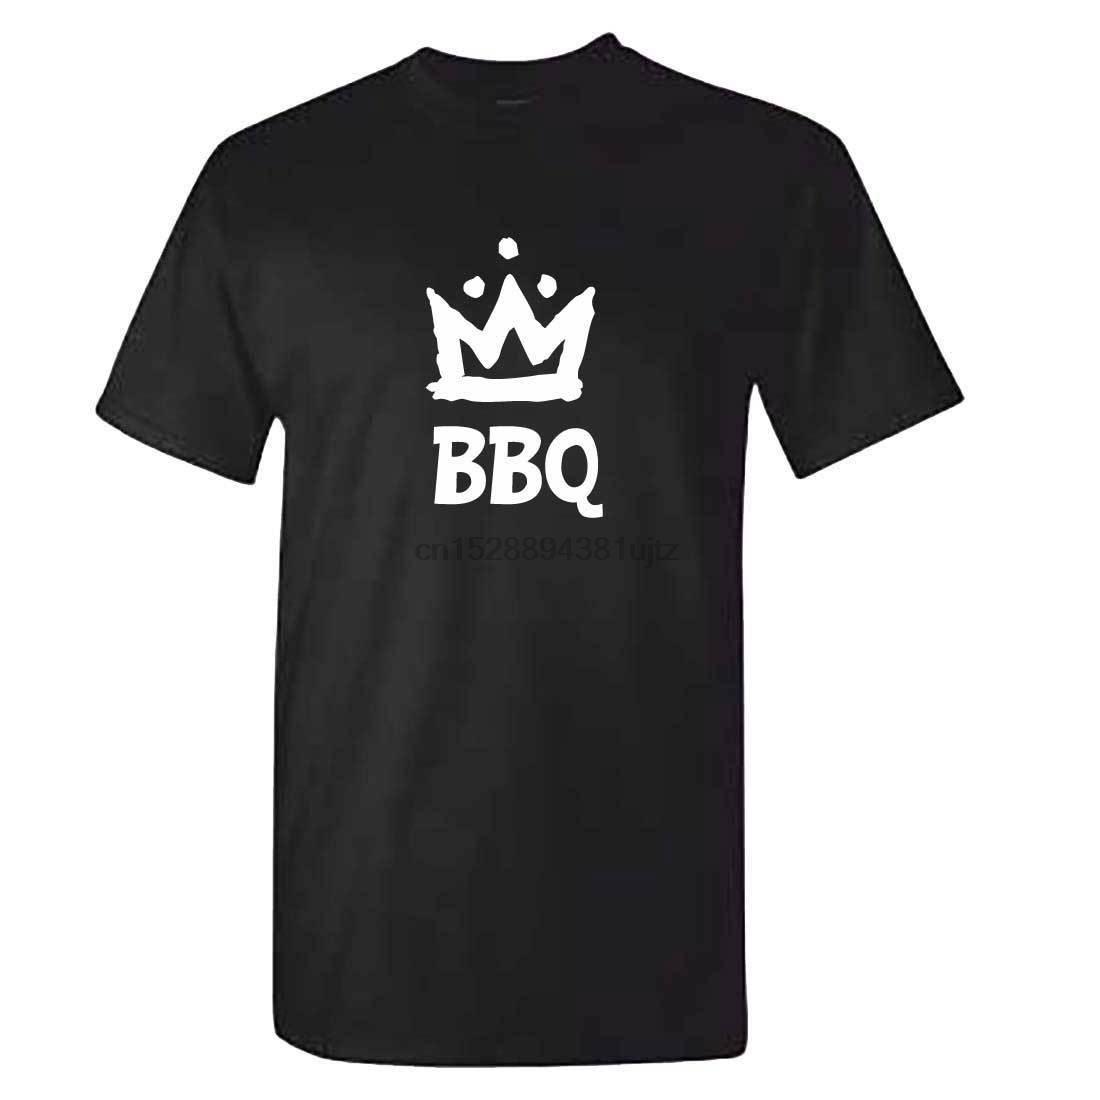 Mens BBQ KING T-shirt - drôle BBQ Barbecue tshirt - Outils Accessoires cadeaux